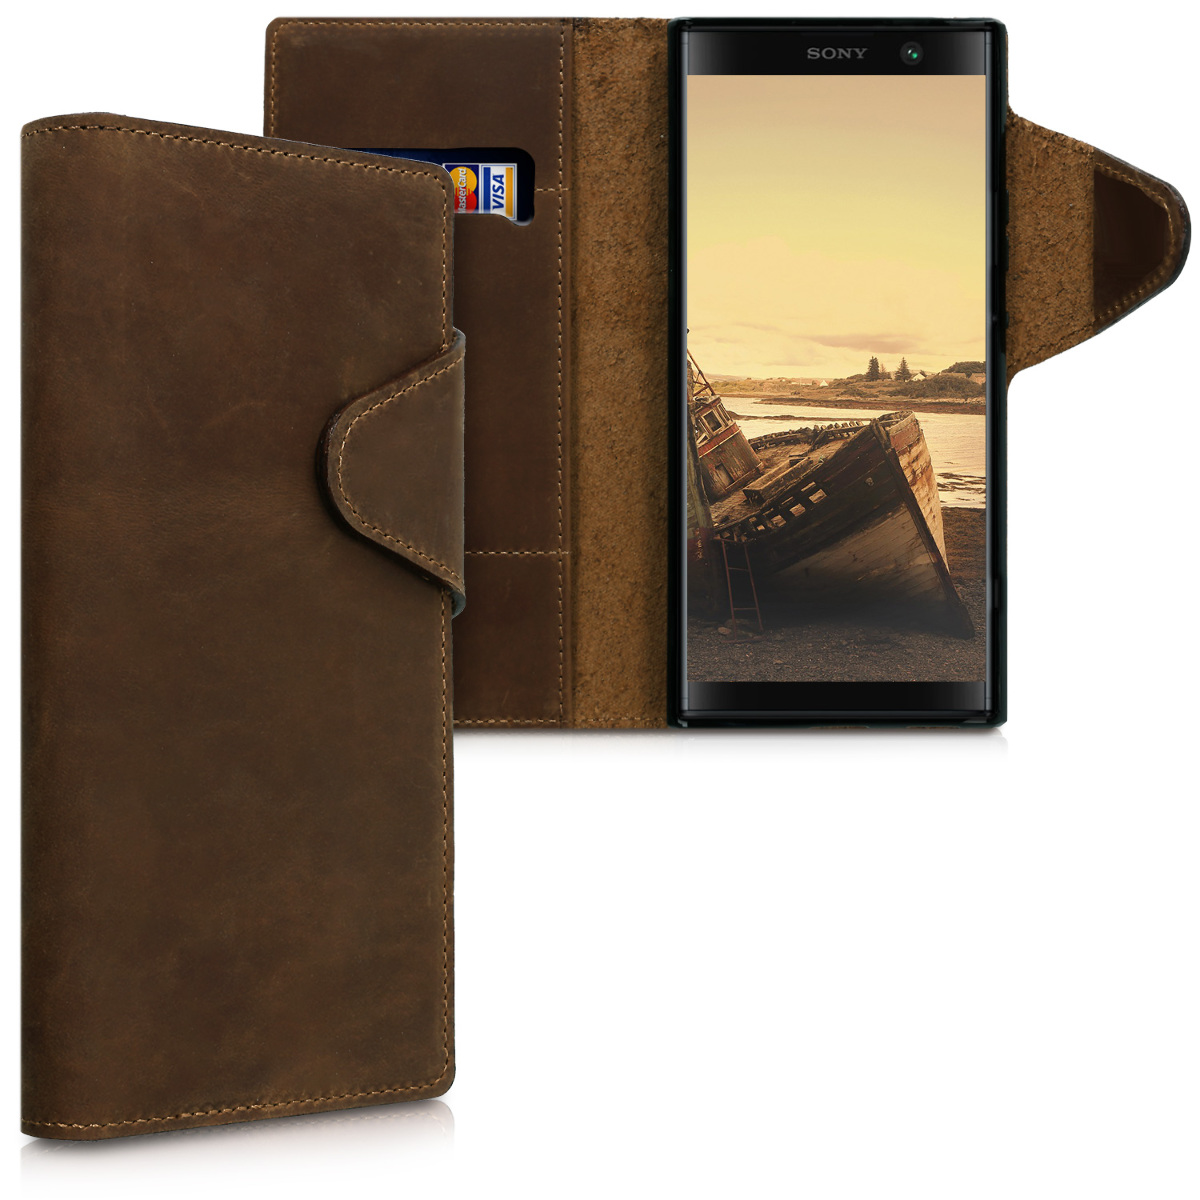 Kalibri Δερμάτινη Suede Θήκη - Πορτοφόλι Sony Xperia XA2 Plus - Brown (45987.05)